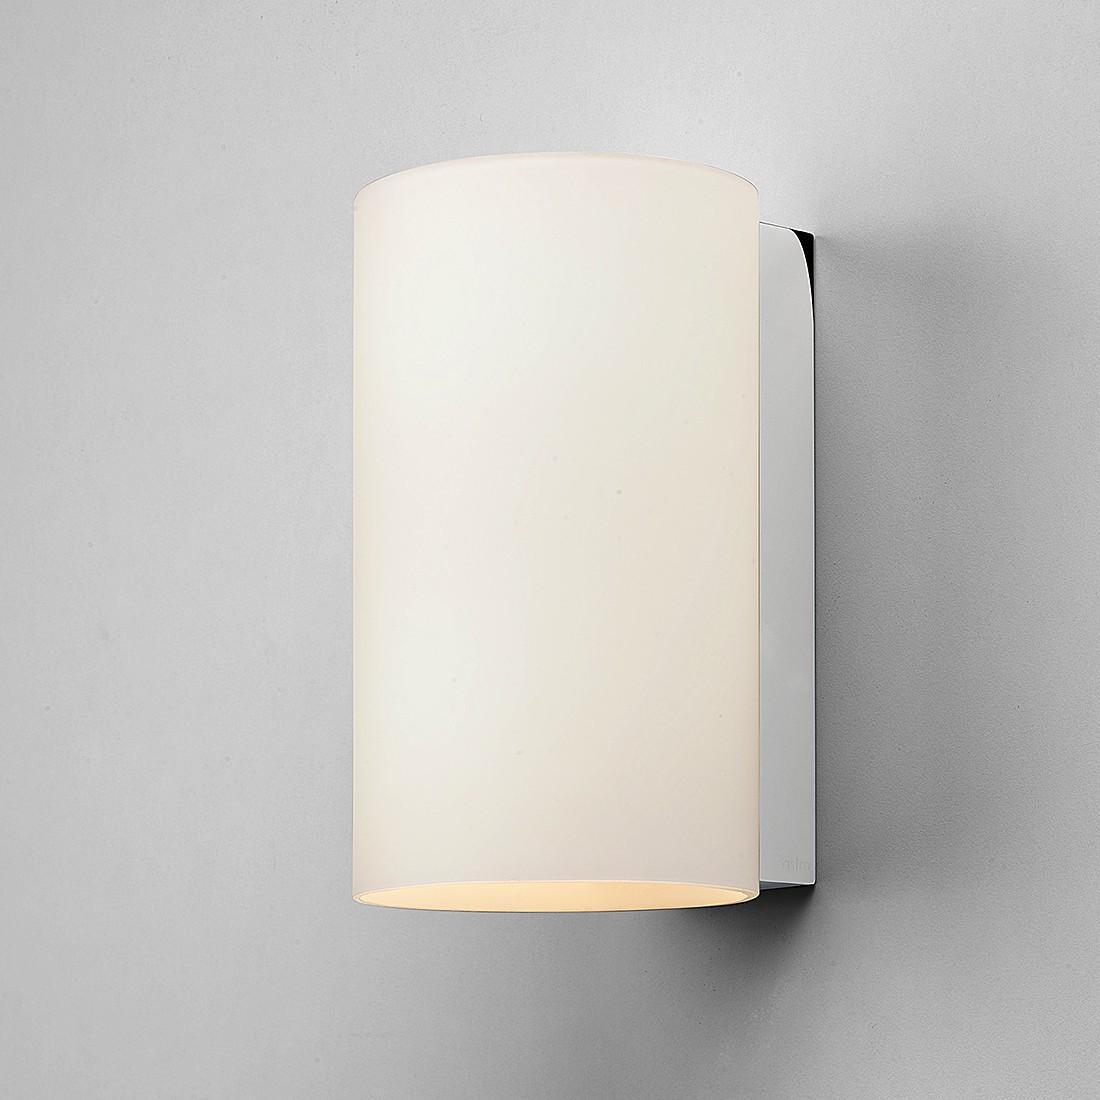 Wandleuchte Cyl 200 ● Weiß ● 2-flammig- Illumina A++